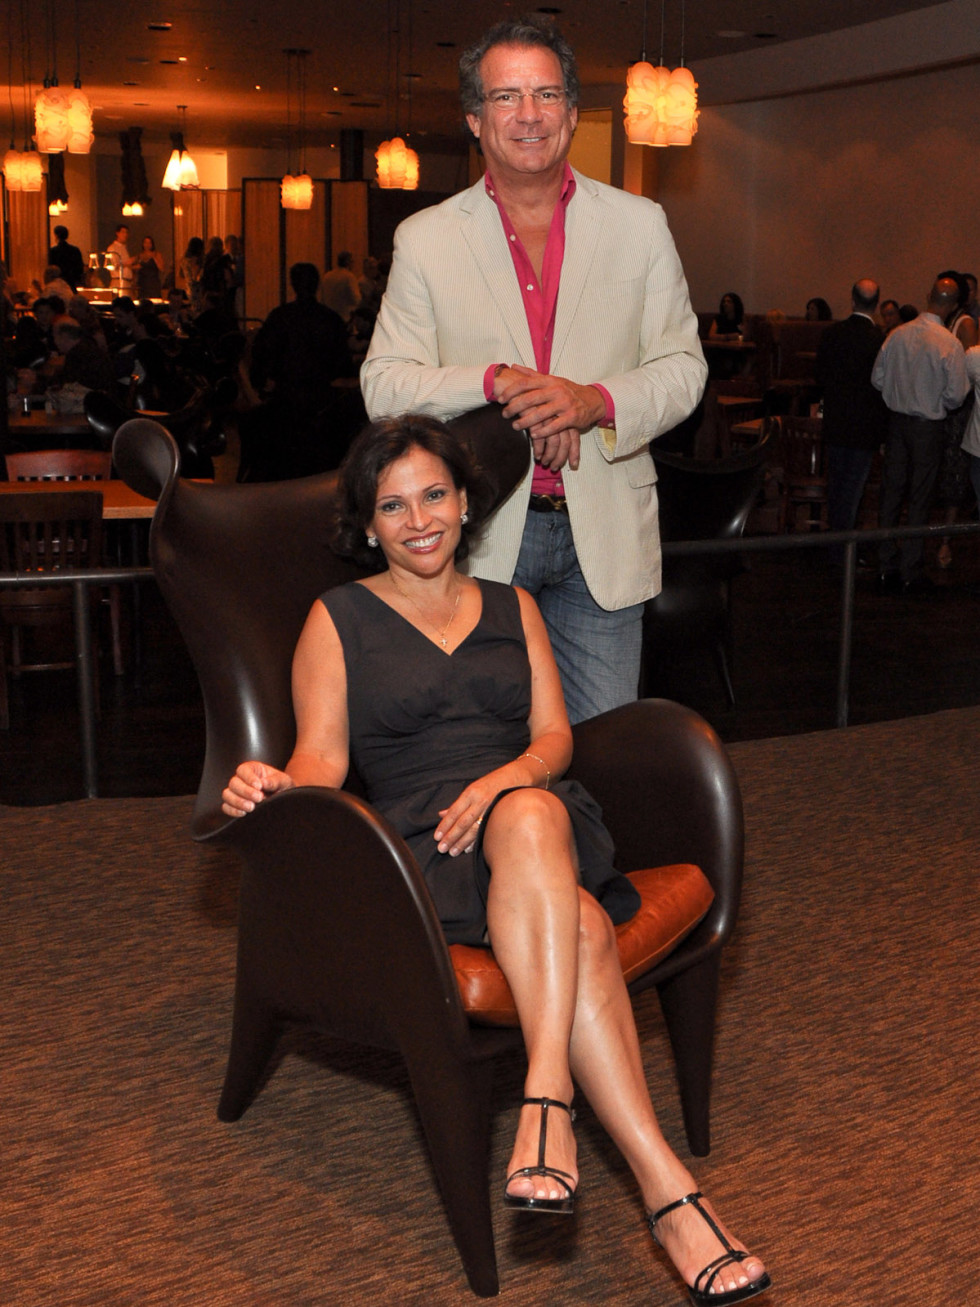 News_Americas_grand opening_Lucia Cordua_Michael Cordua